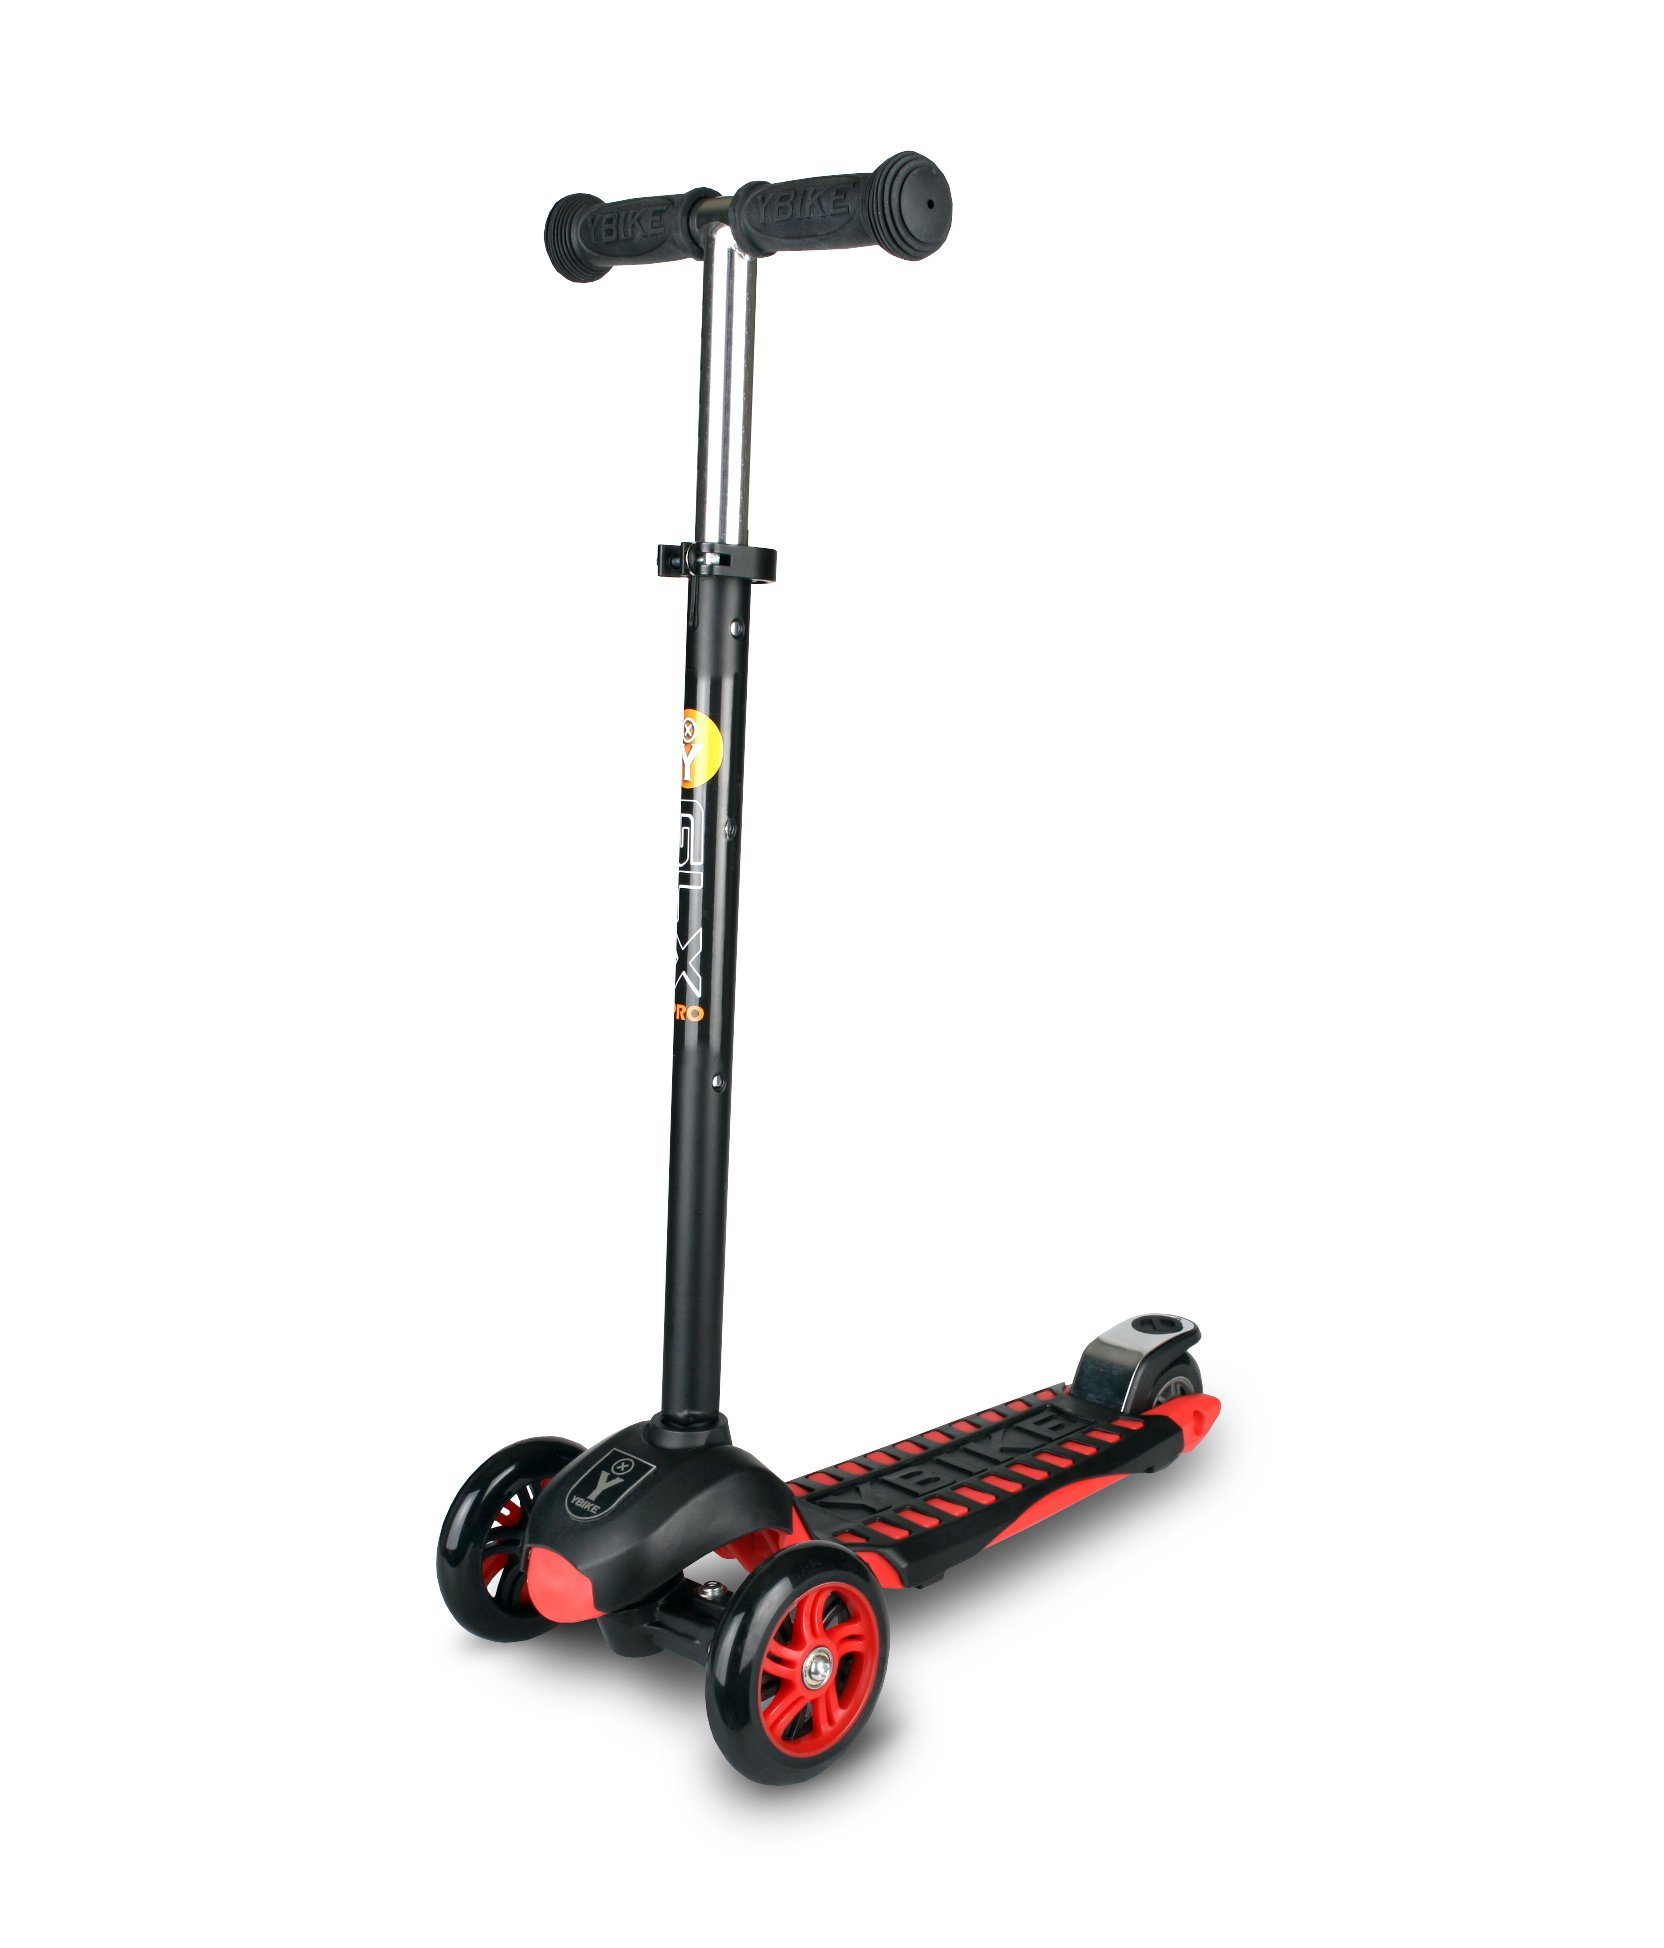 YBIKE GLX Pro Scooter, Black/Red, 12cm